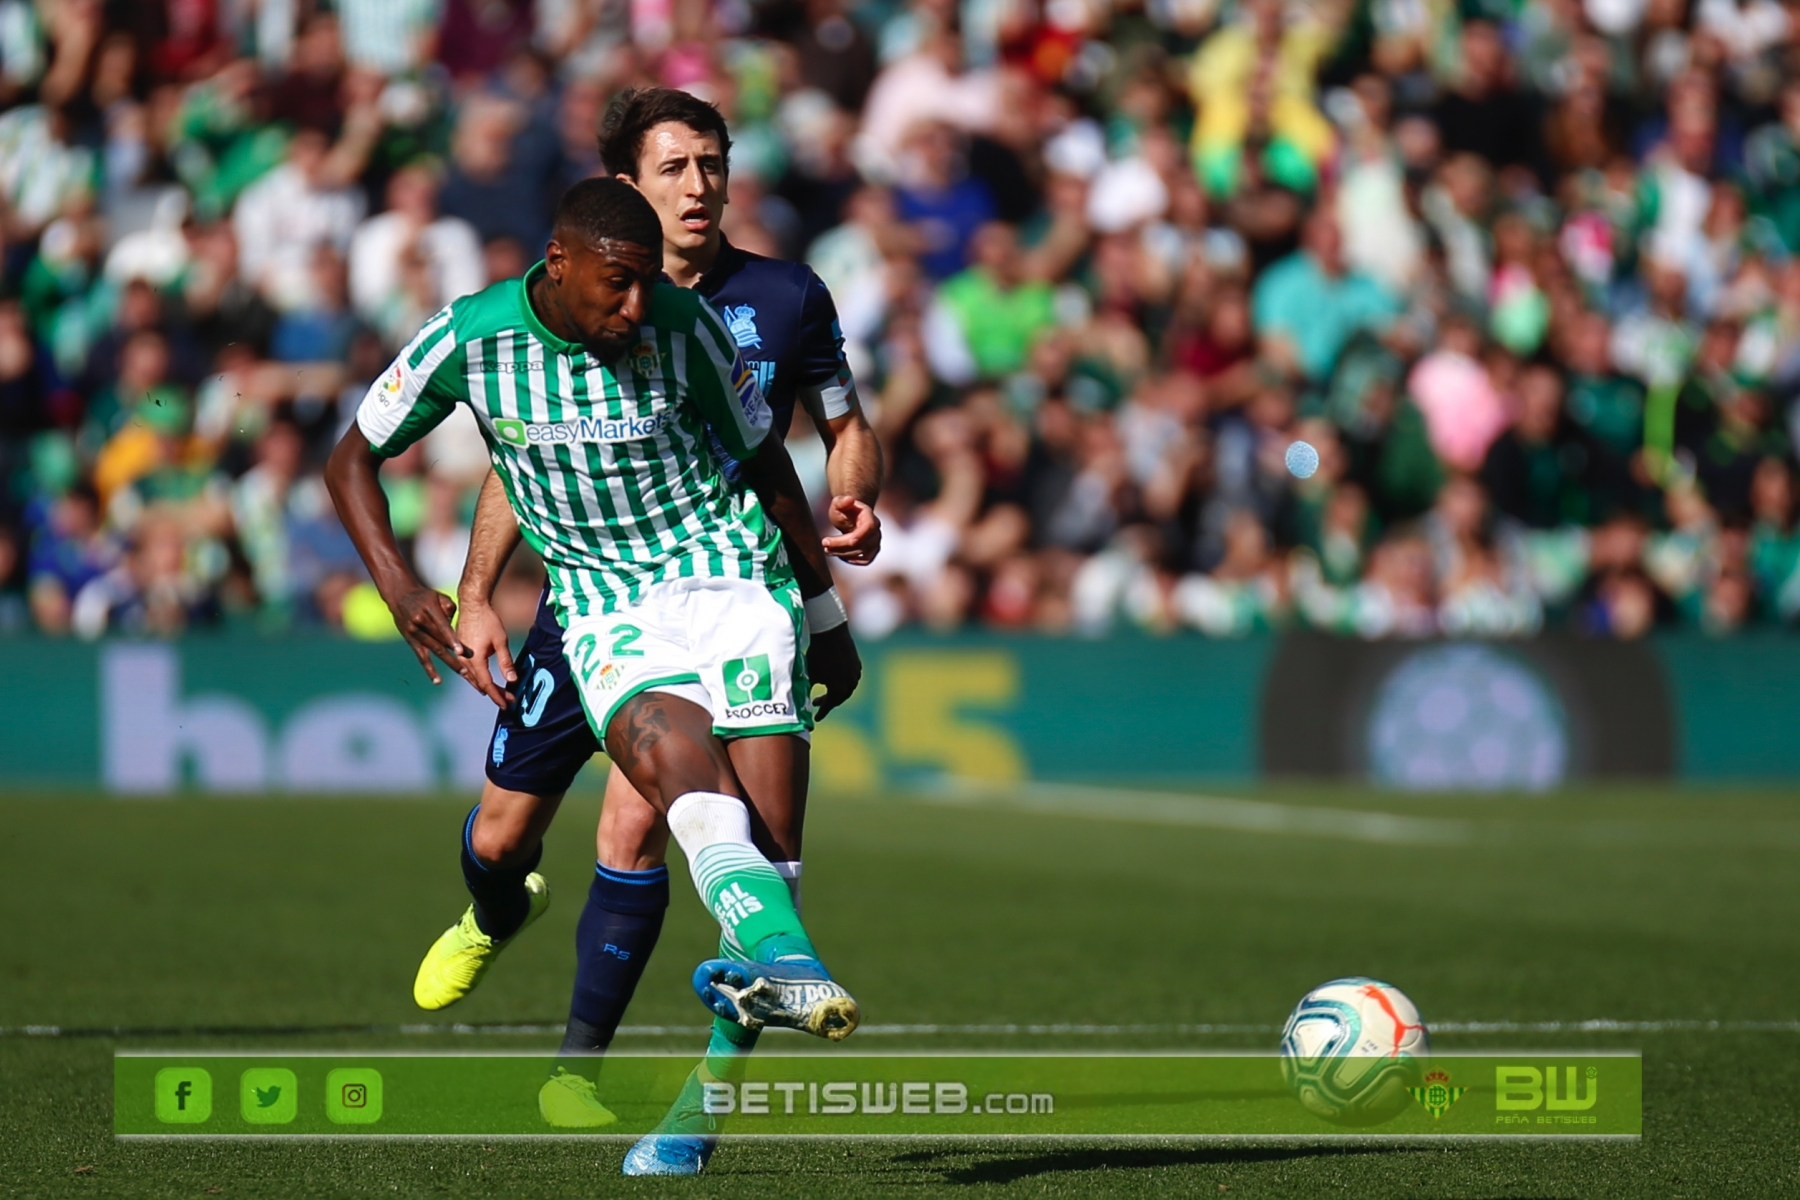 J20 Real Betis - Real Sociedad 12